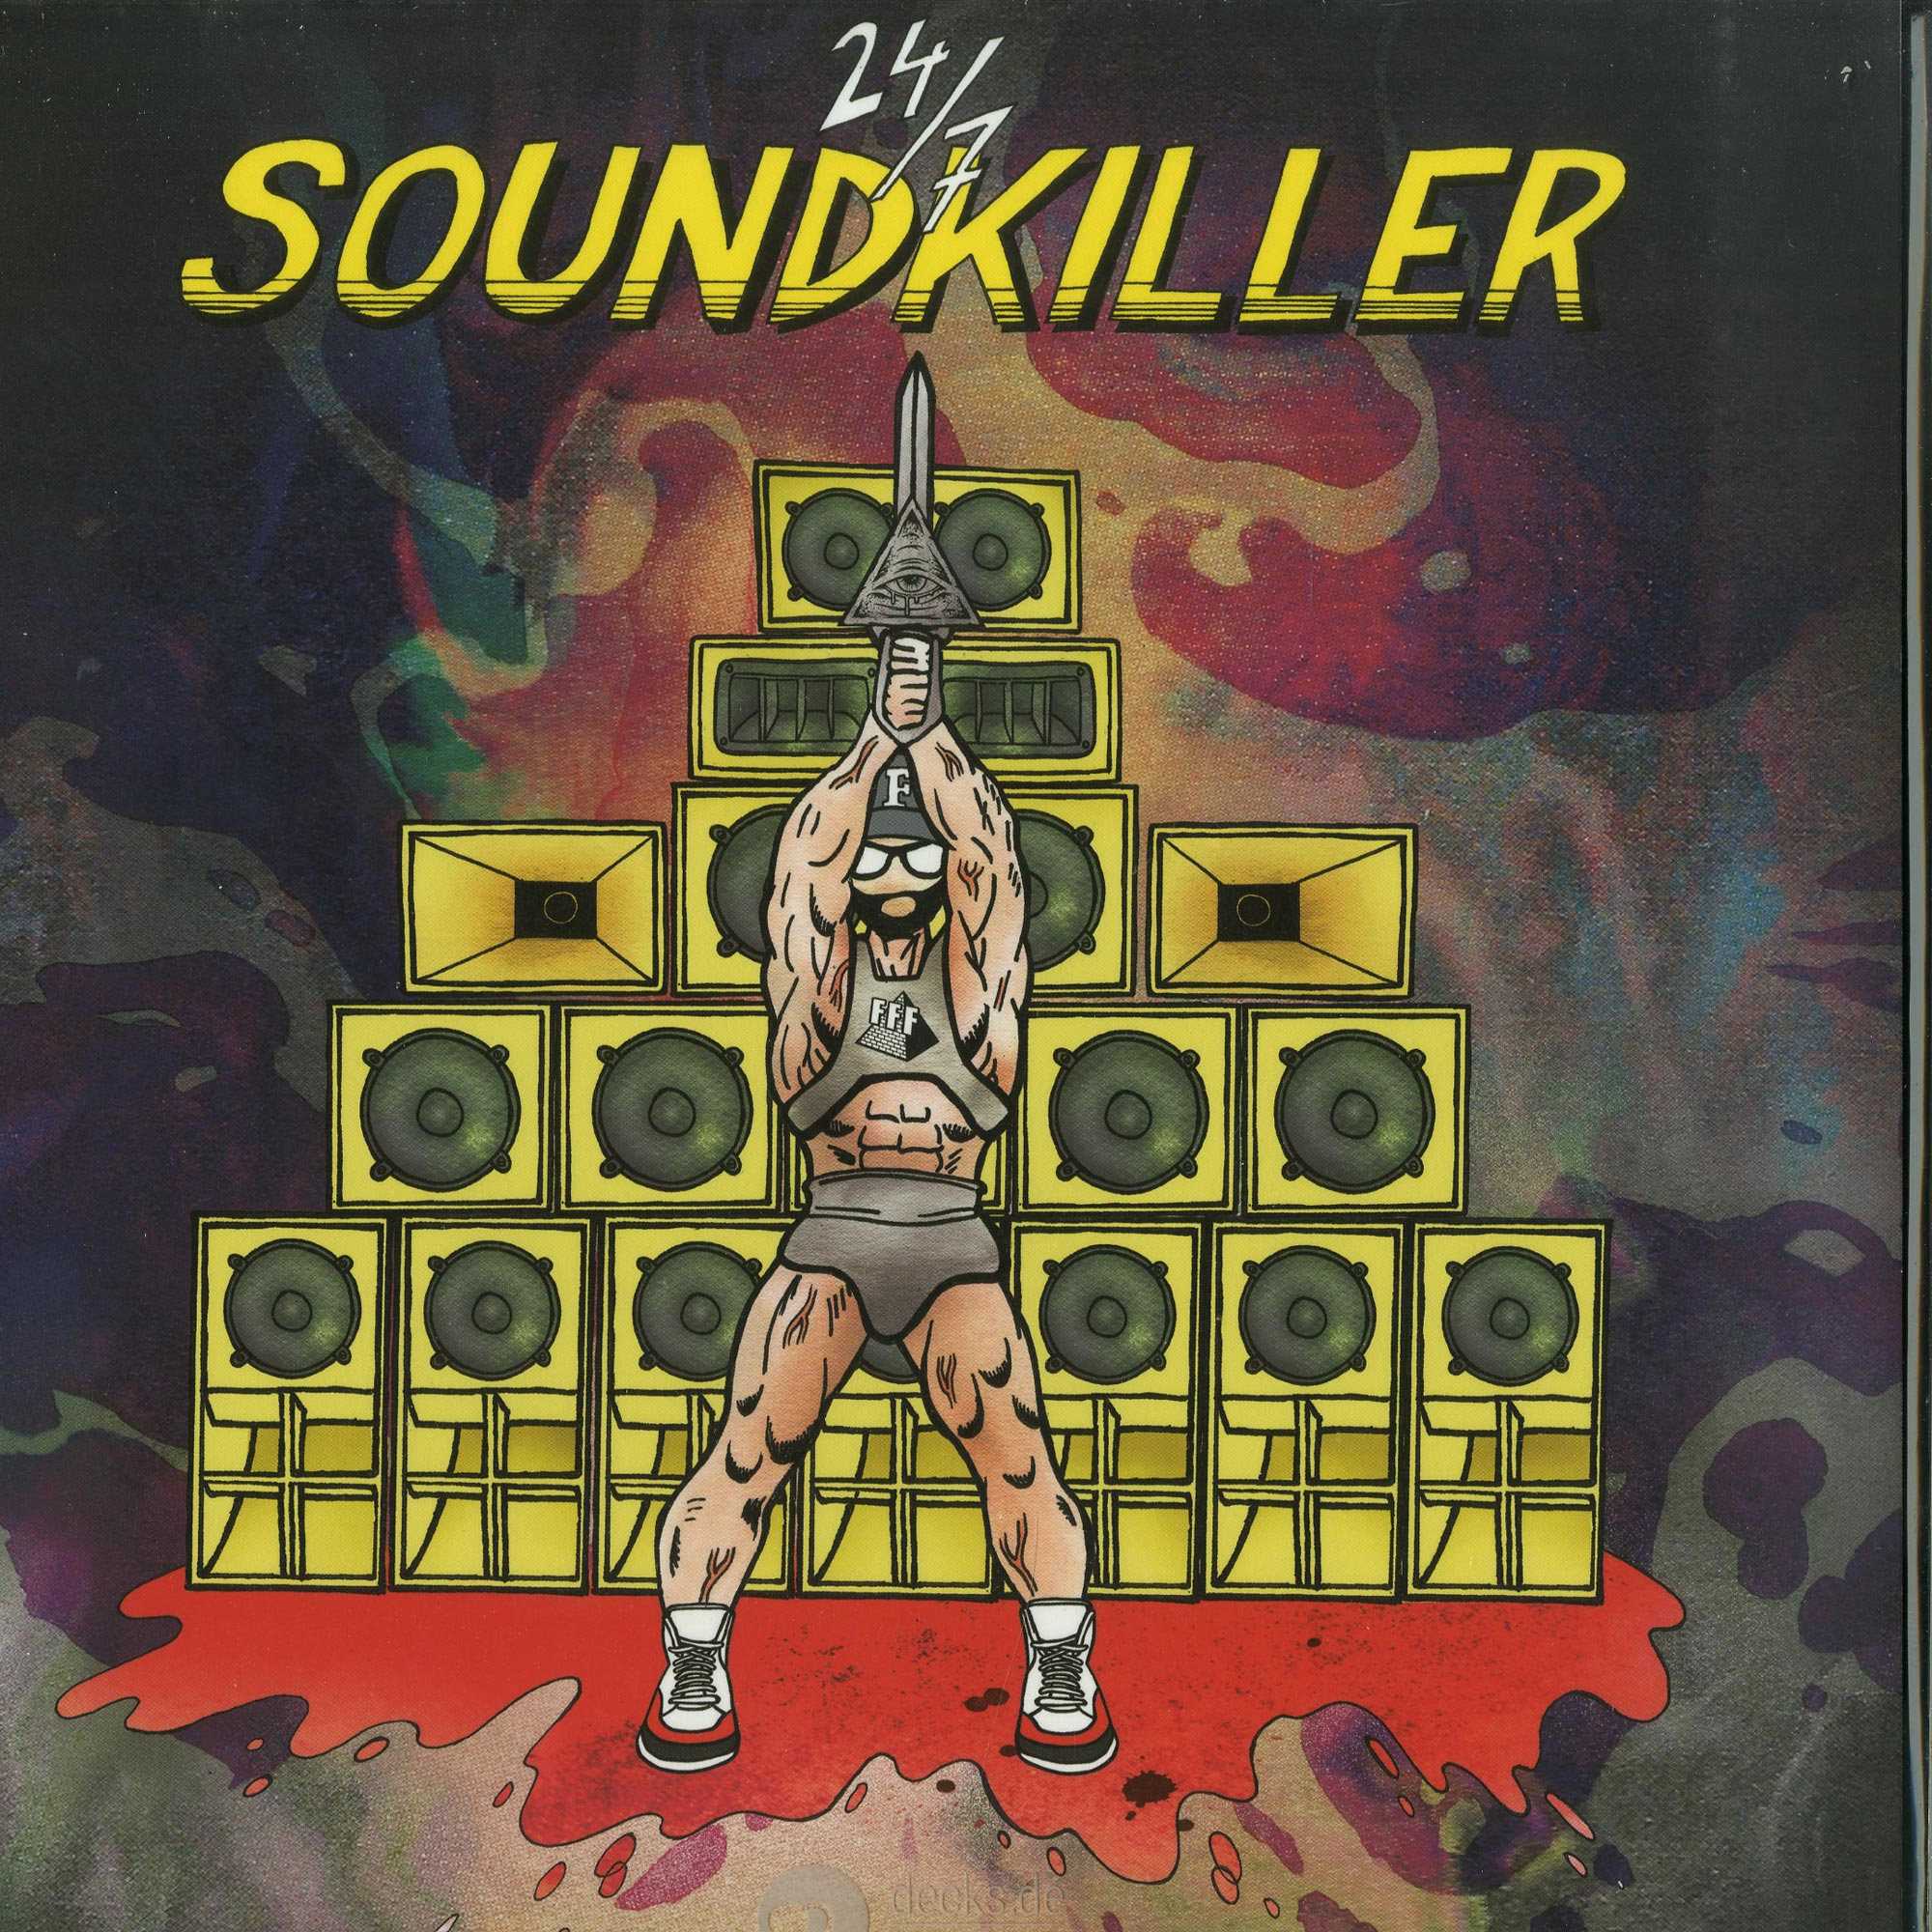 FFF - 24/7 SOUNDKILLER EP